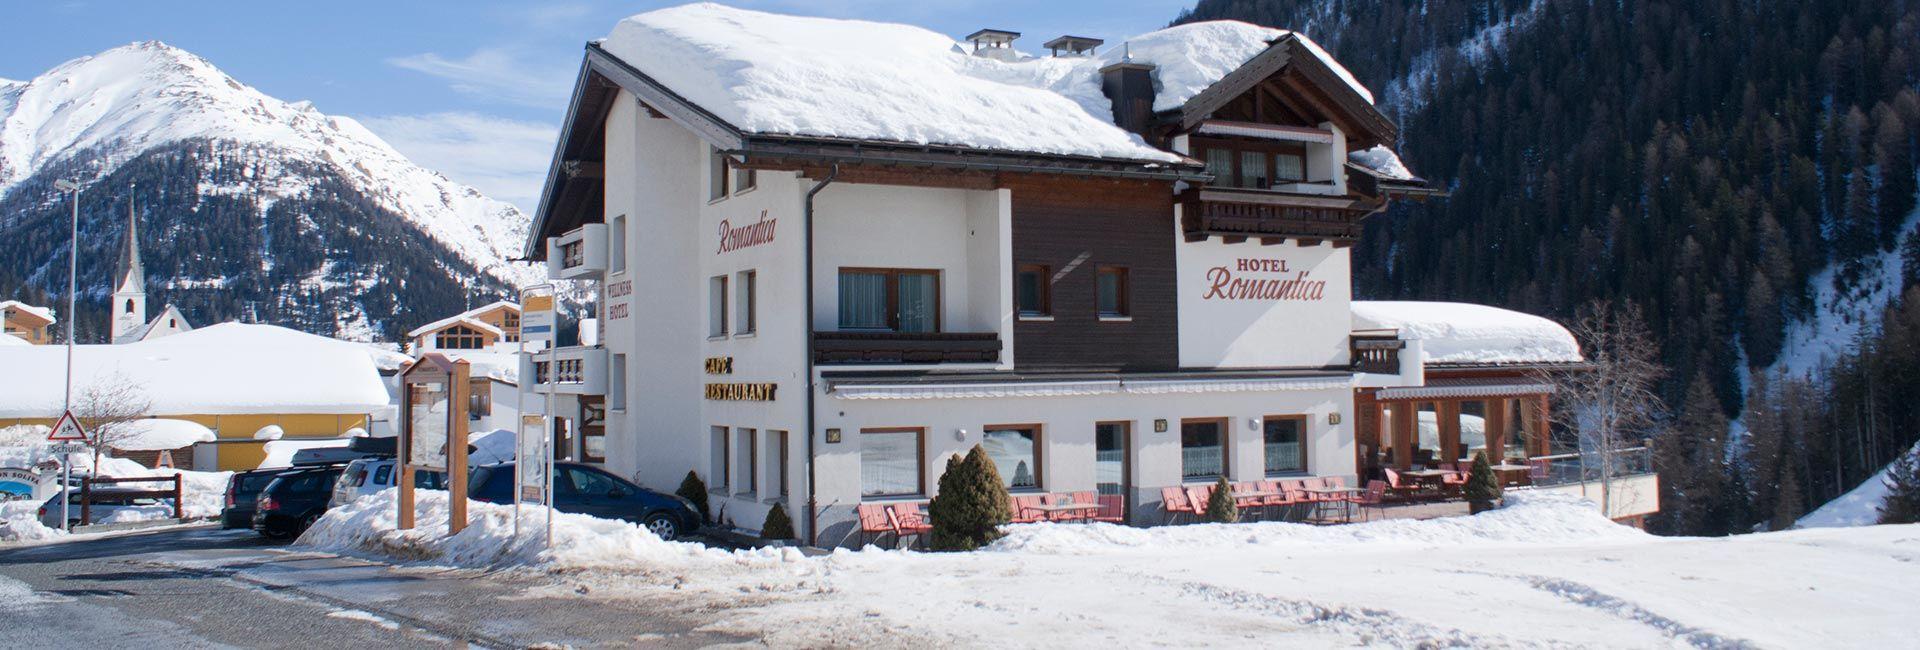 Samnaun Hotel Romantica